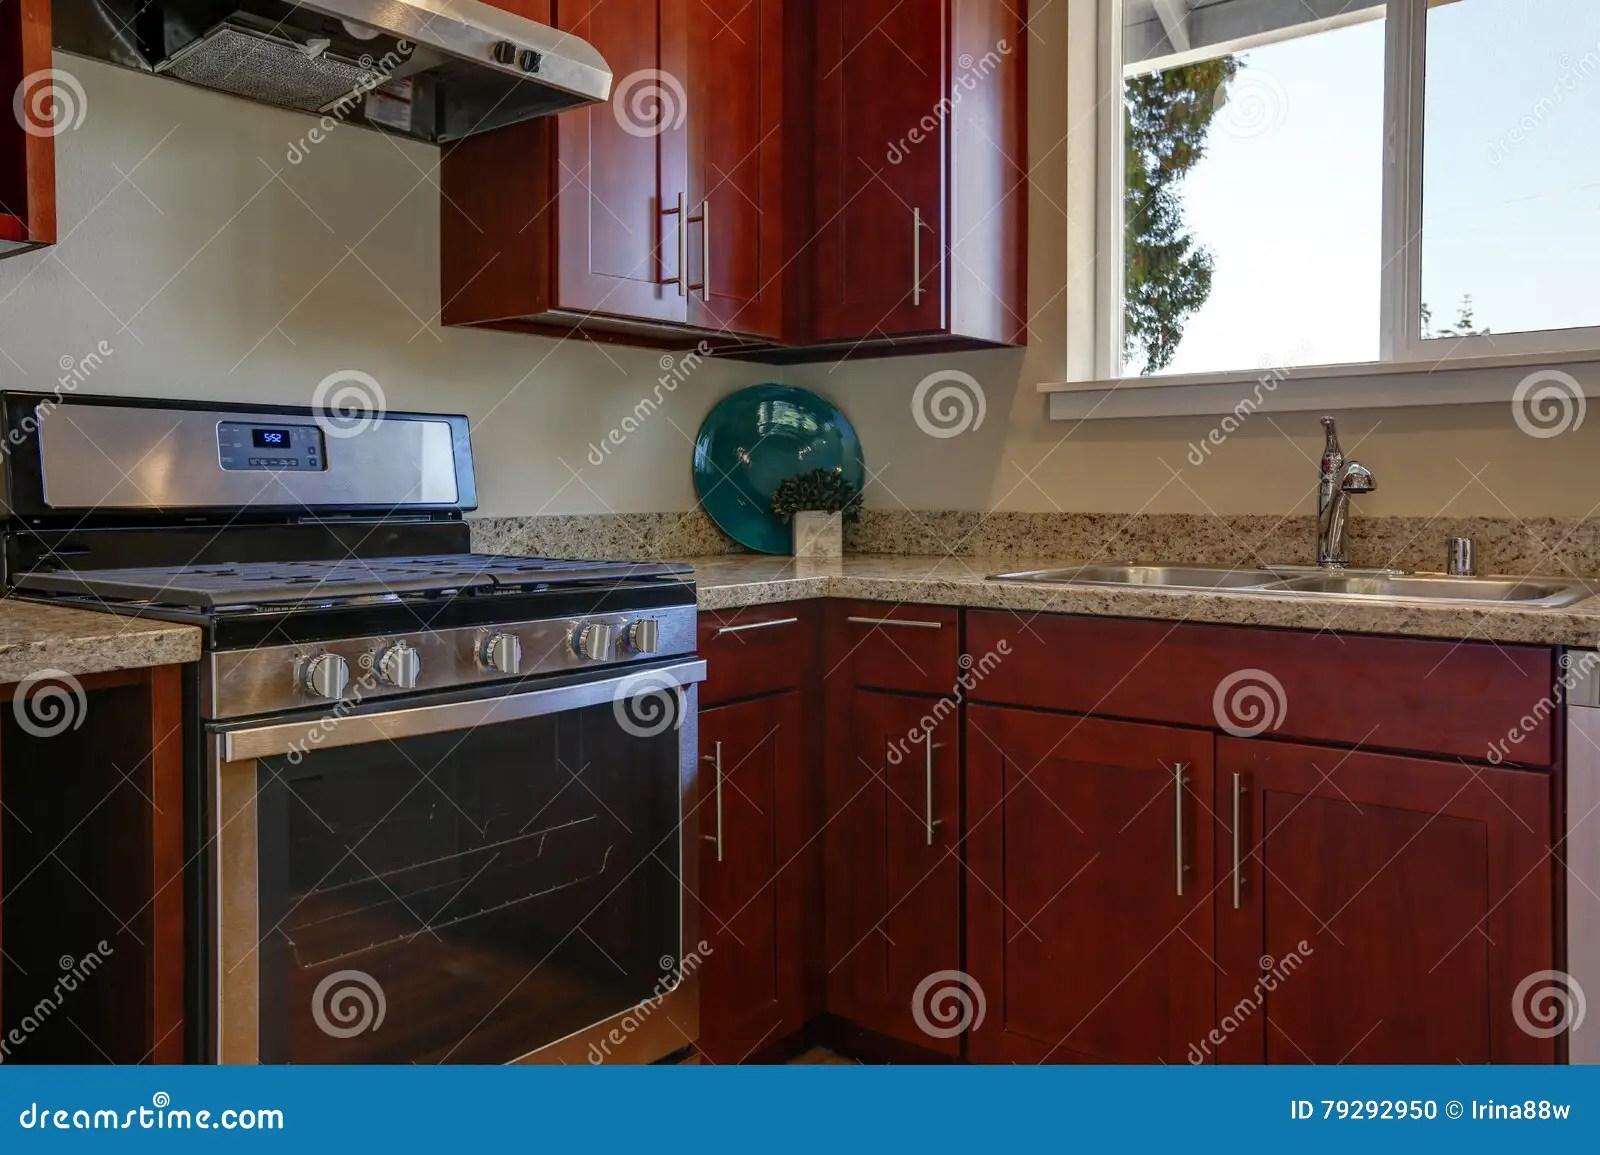 renew kitchen cabinets faucet wall mount 伯根地有花岗岩桌面的厨柜看法库存照片 图片包括有庄园 更新 装备 伯根地有花岗岩桌面的厨柜看法